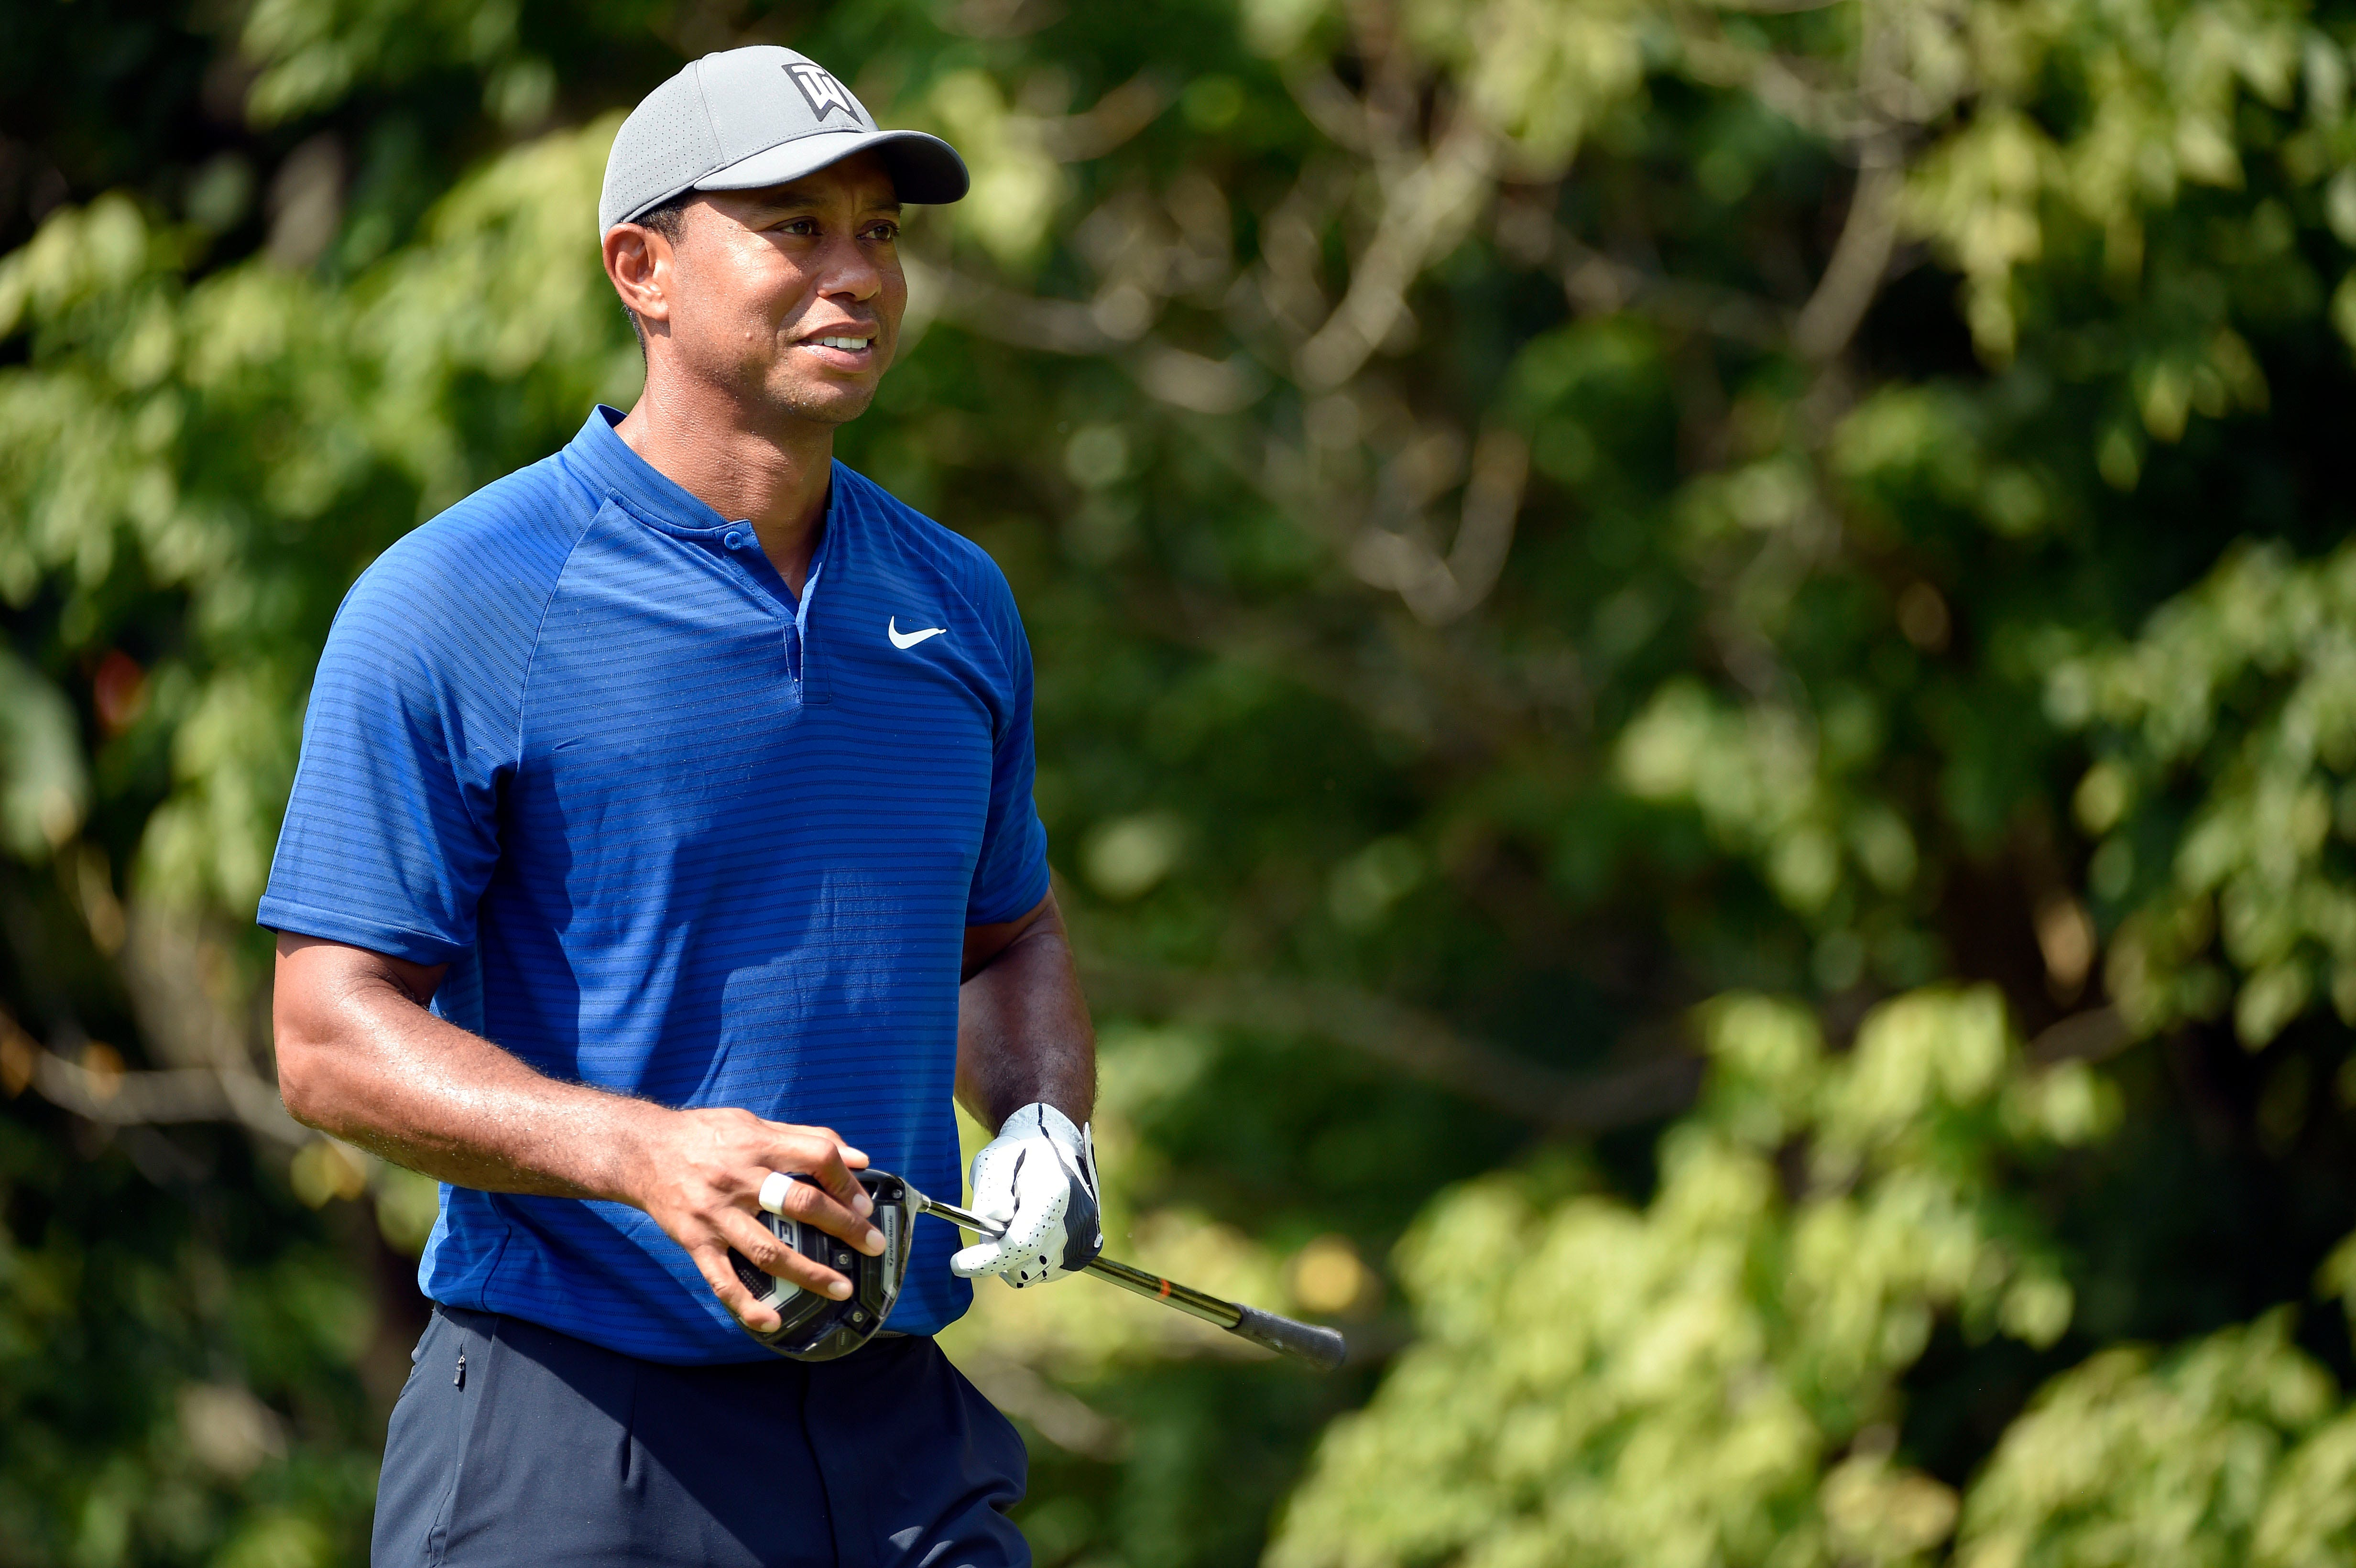 Tiger Tracker: Follow Tiger Woods' Thursday round at the PGA Championship shot-by-shot